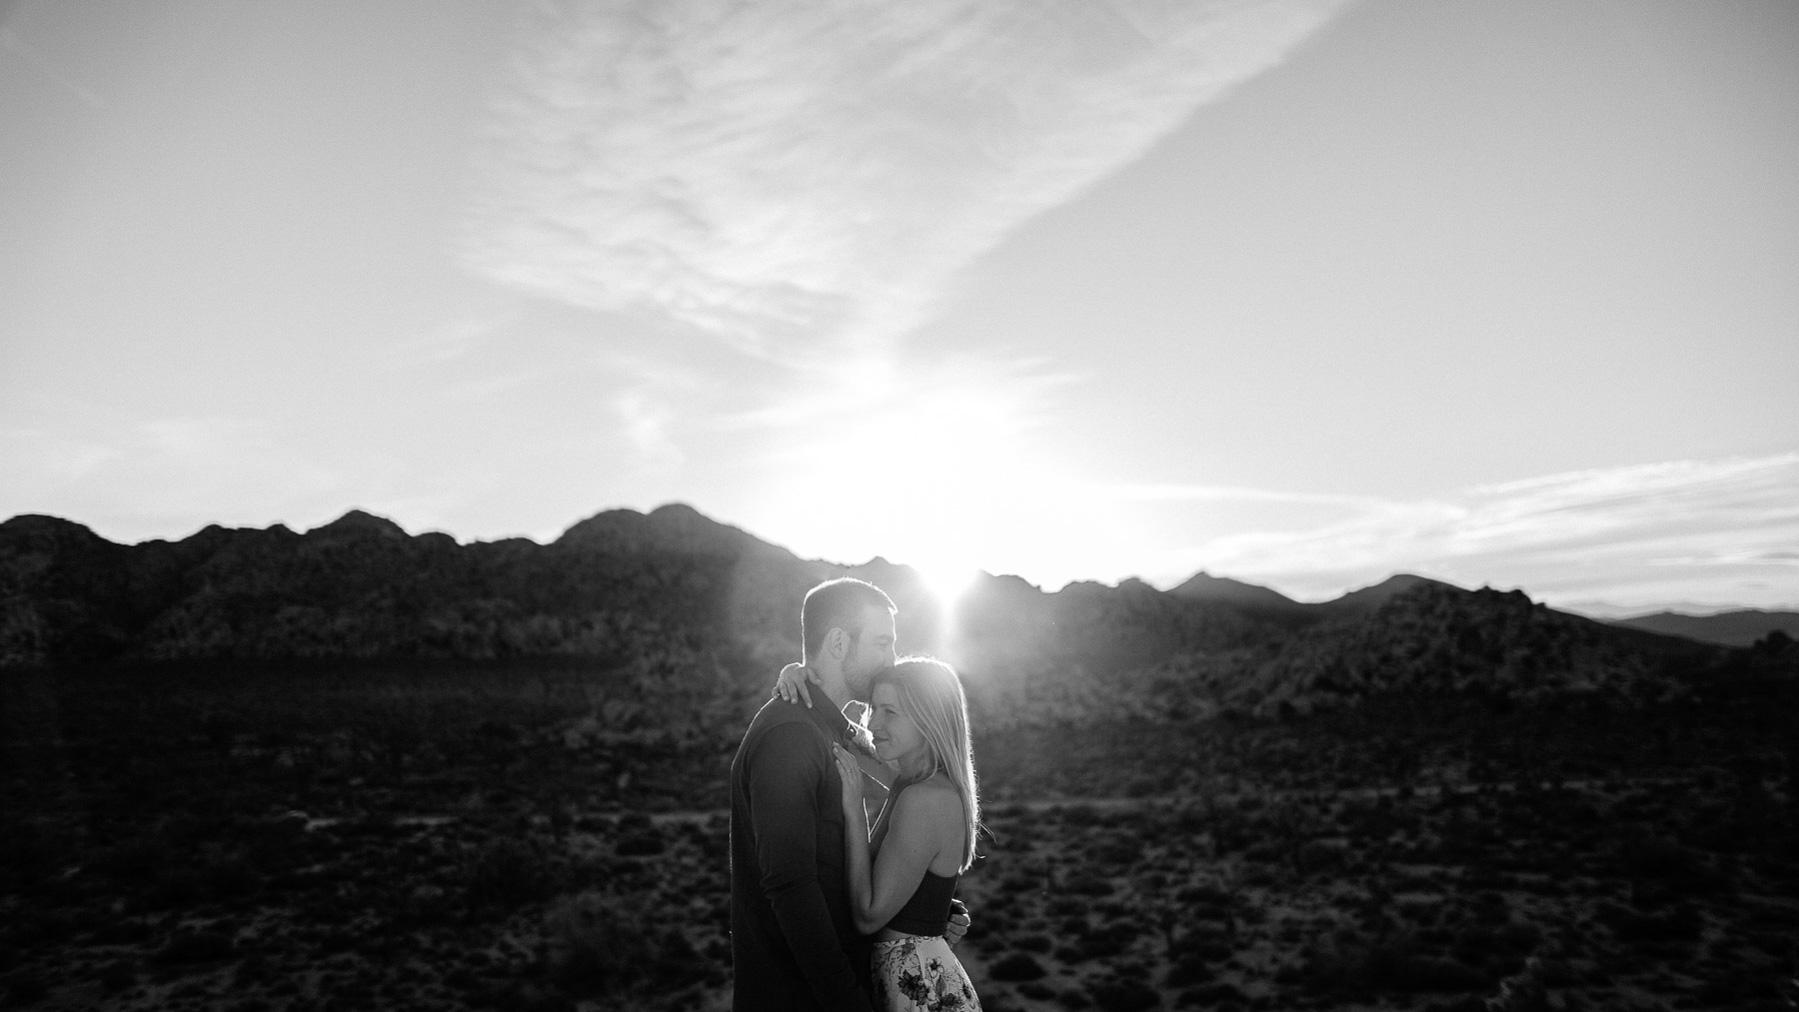 Joshua_Tree_Engagement_Wedding_Elopement_Photogapher_61.jpg